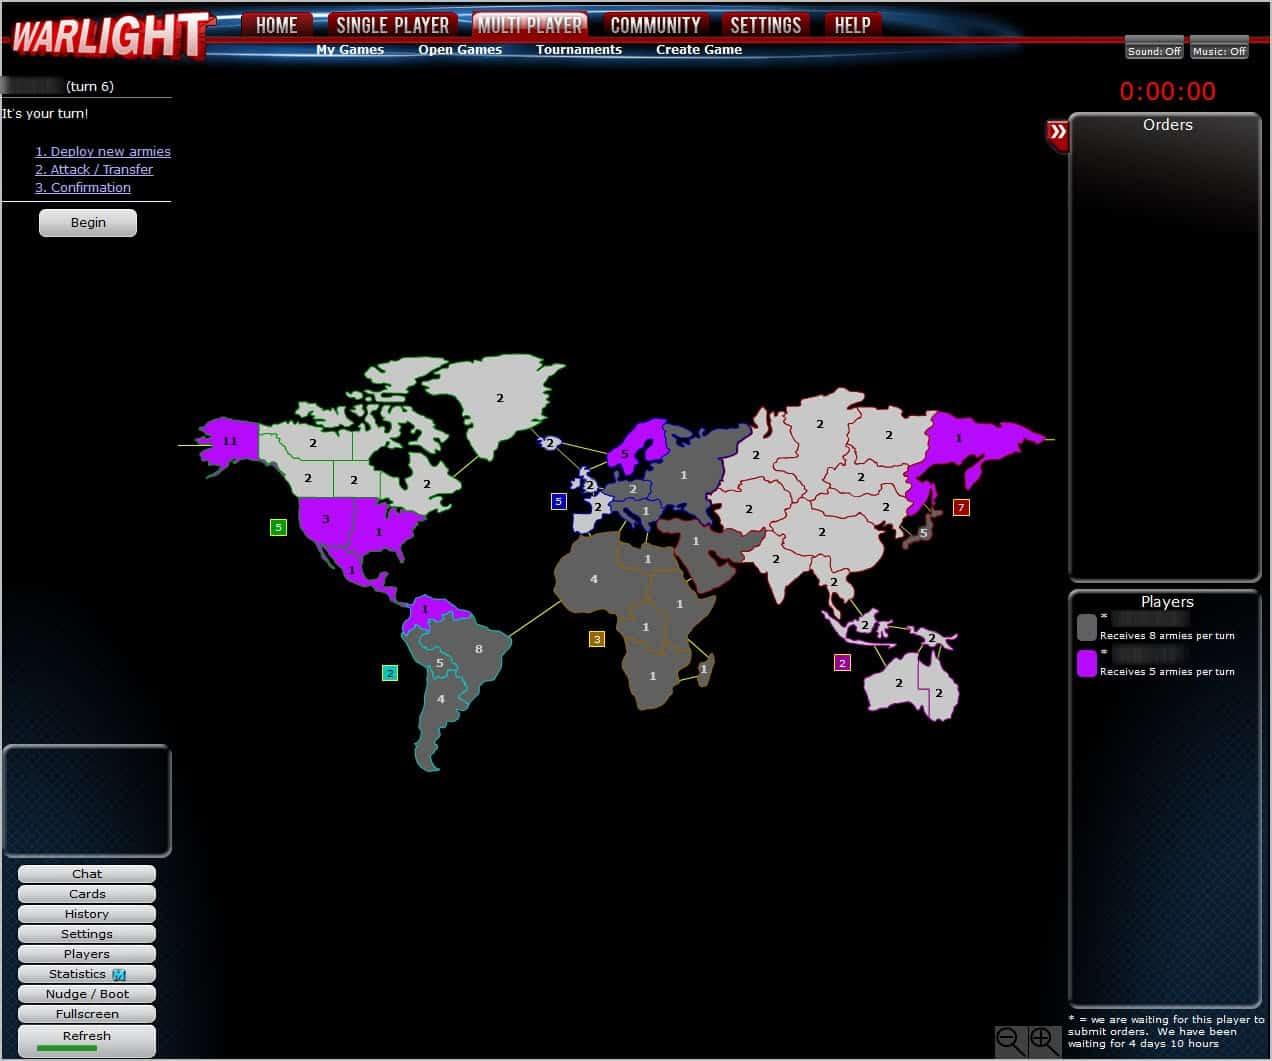 risiko online warlight